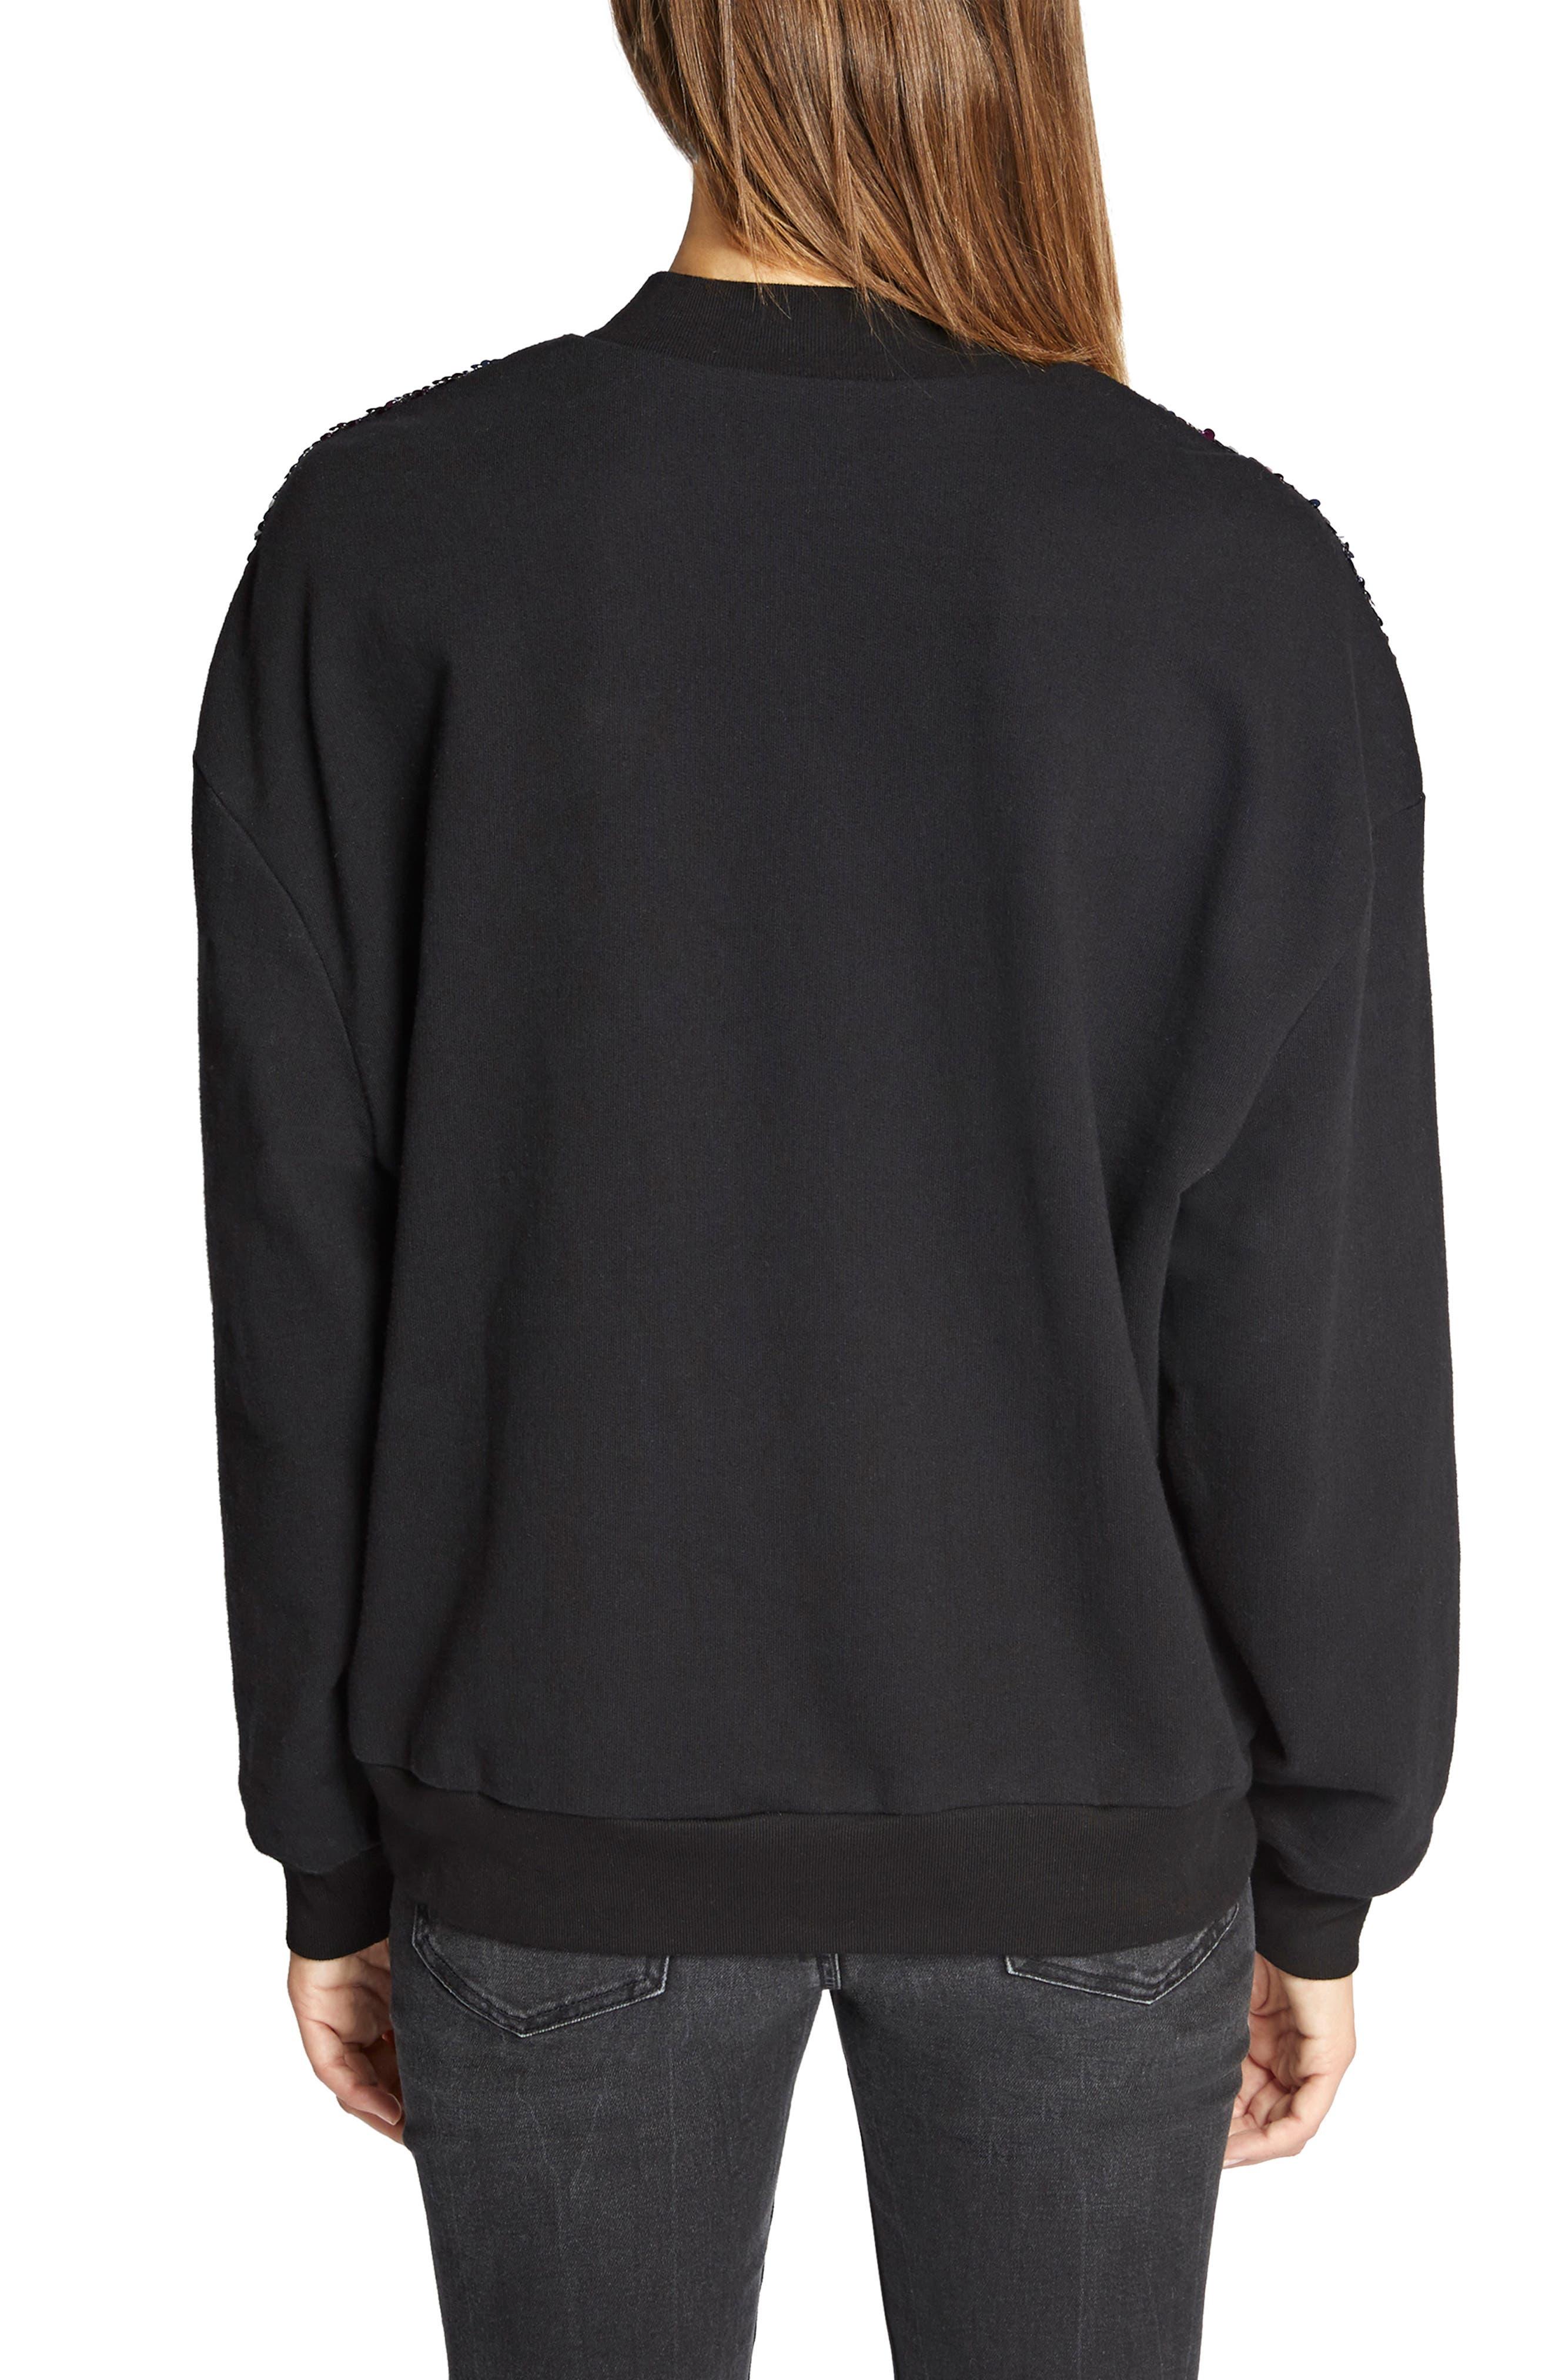 Last Dance Sequin Sweatshirt,                             Alternate thumbnail 2, color,                             BLACK